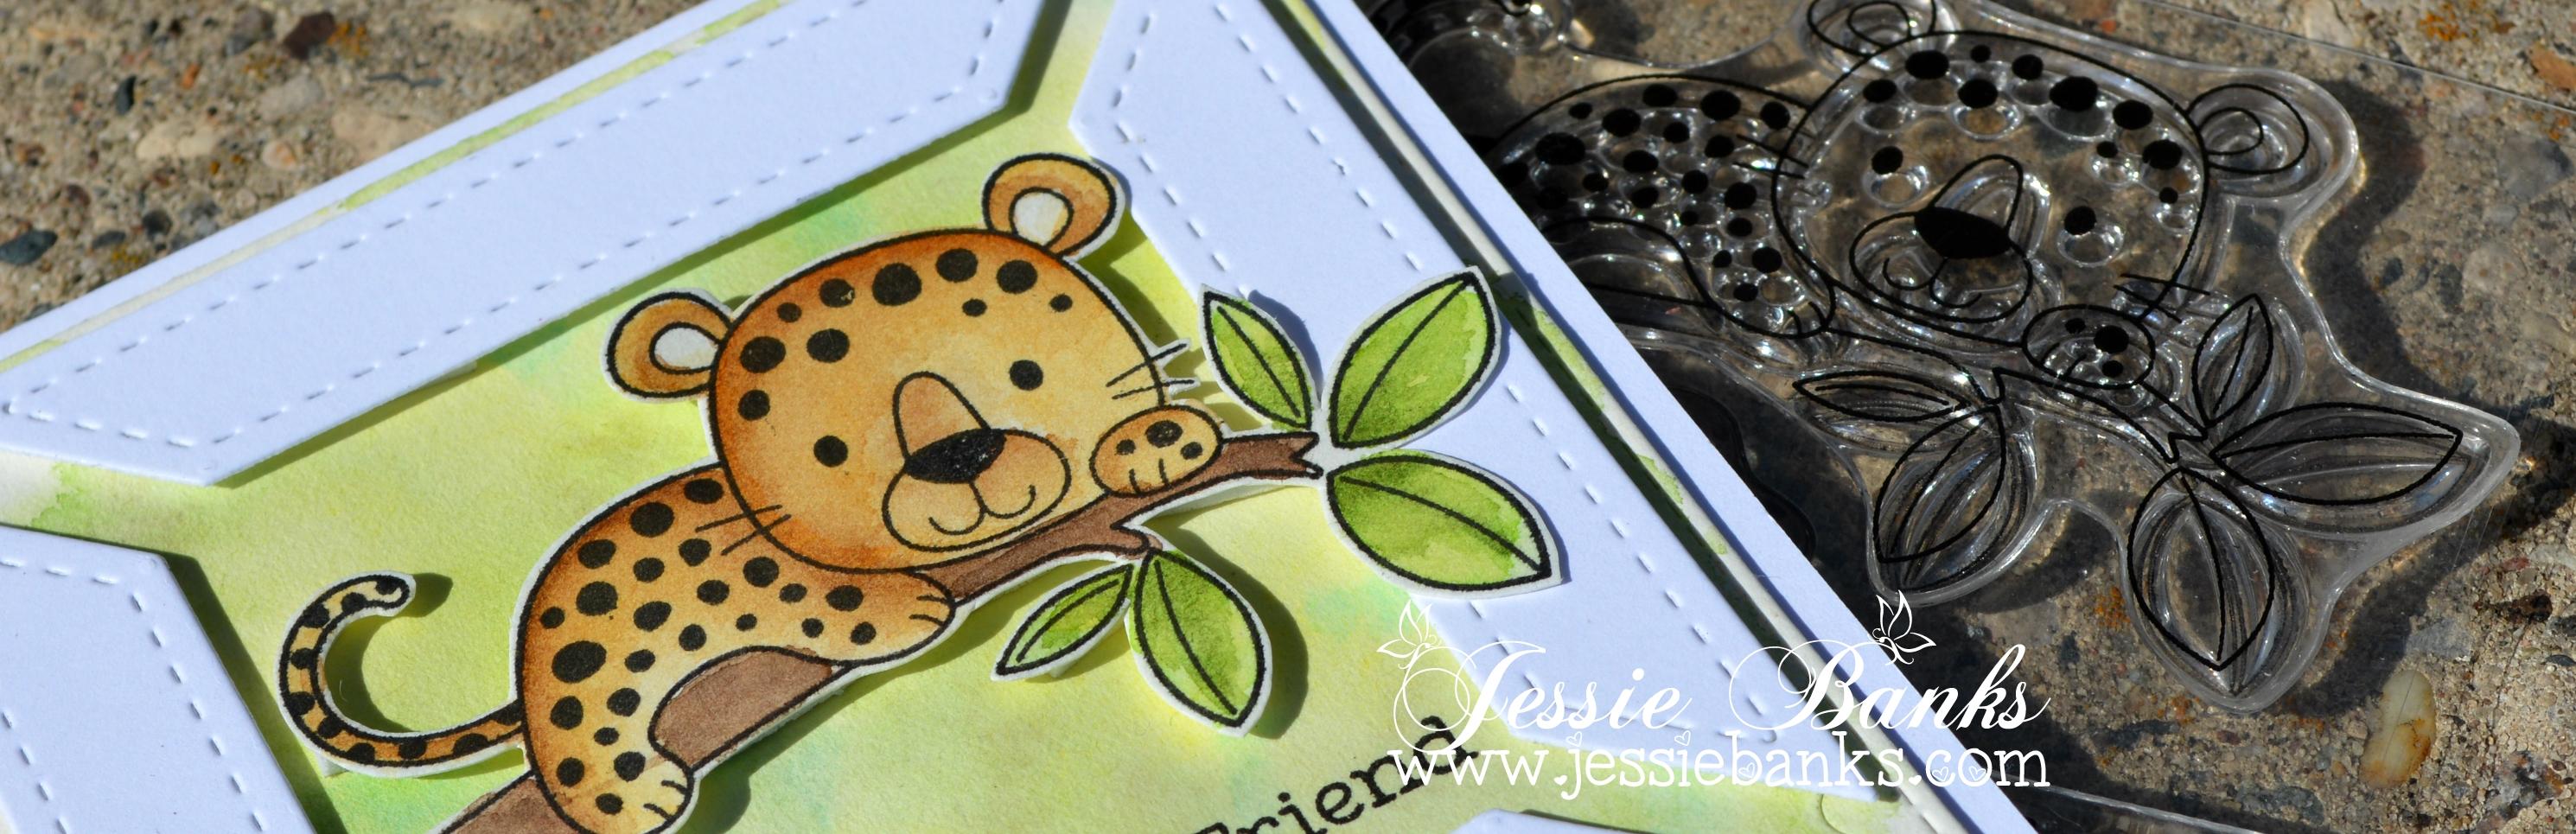 MFT - Loveable Leopards 2 - Jessie Banks